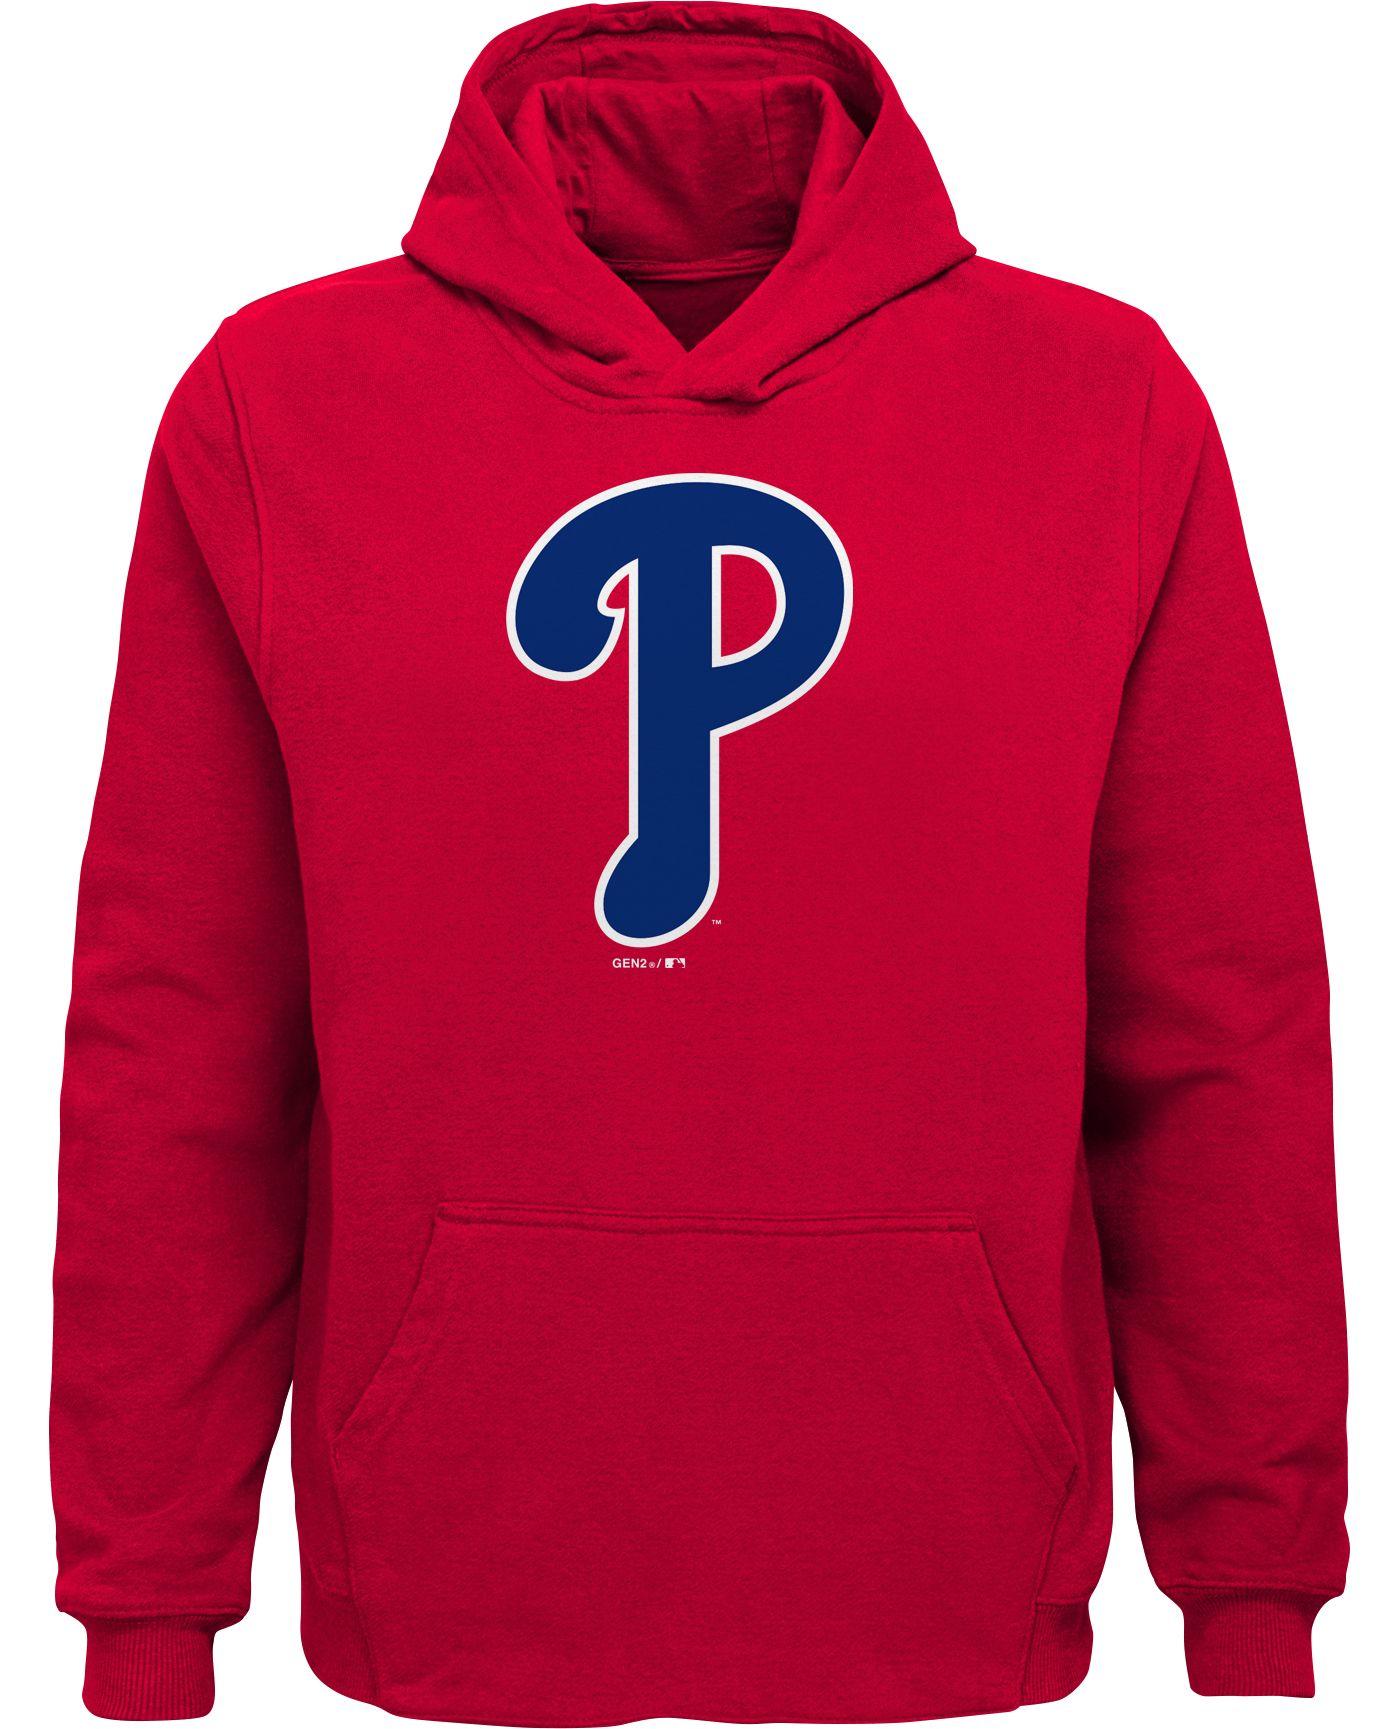 Gen2 Youth Philadelphia Phillies Pullover Hoodie